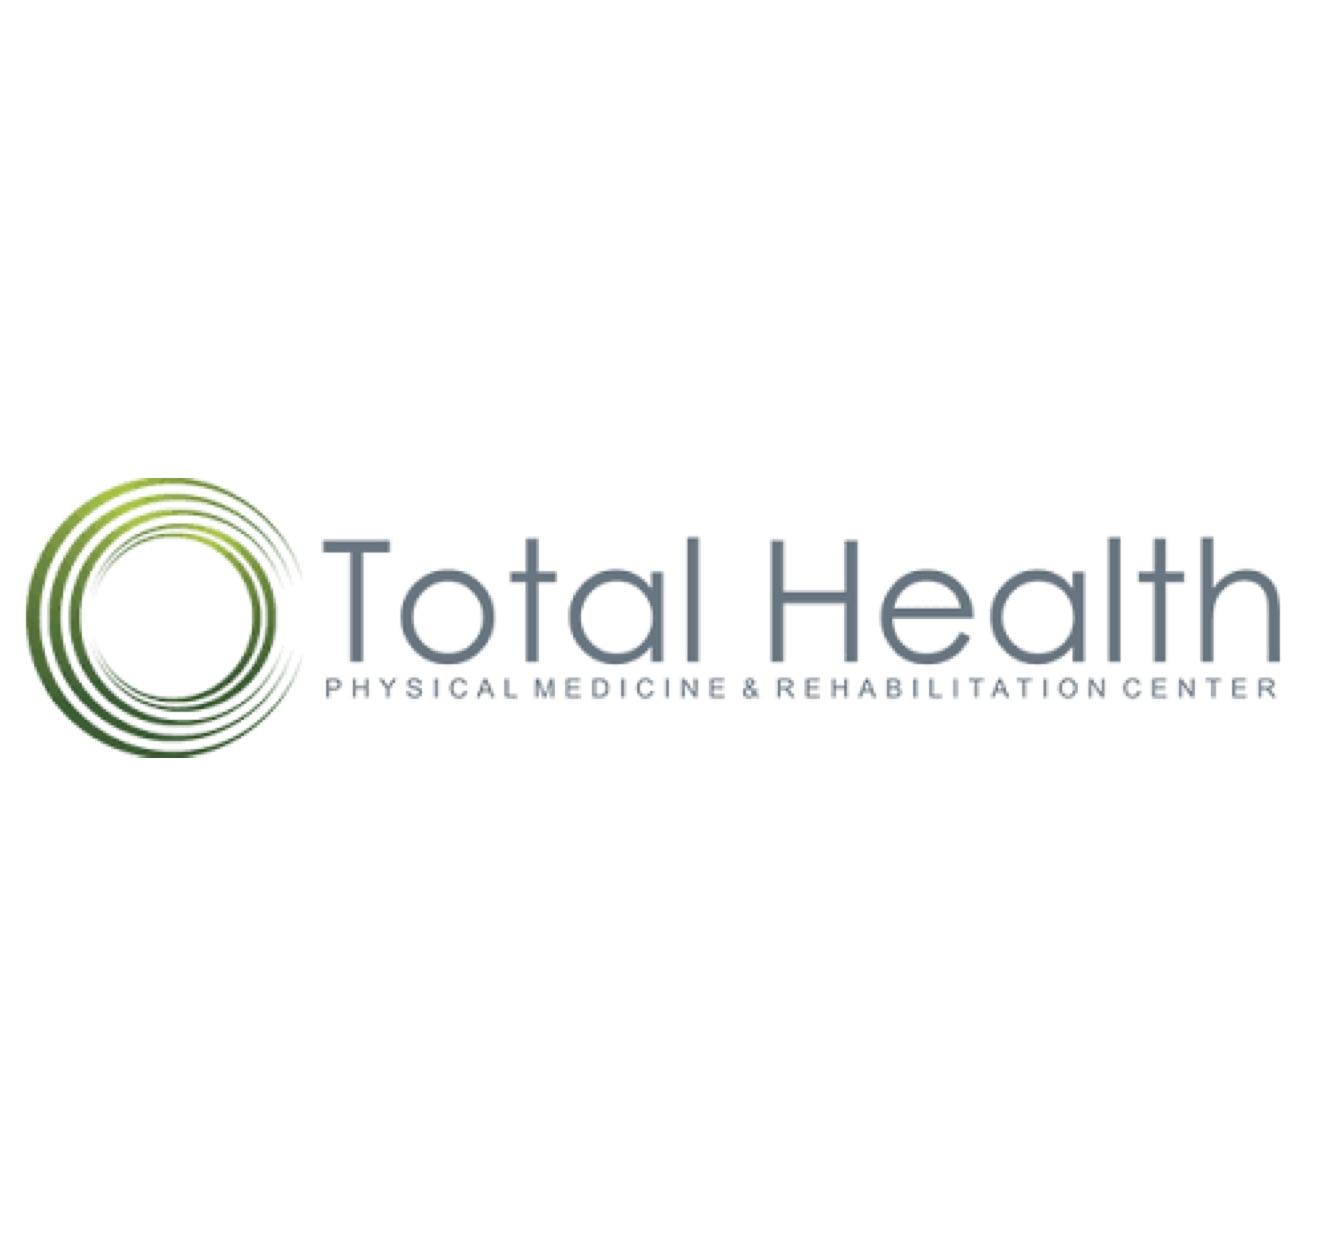 Total Health.jpg